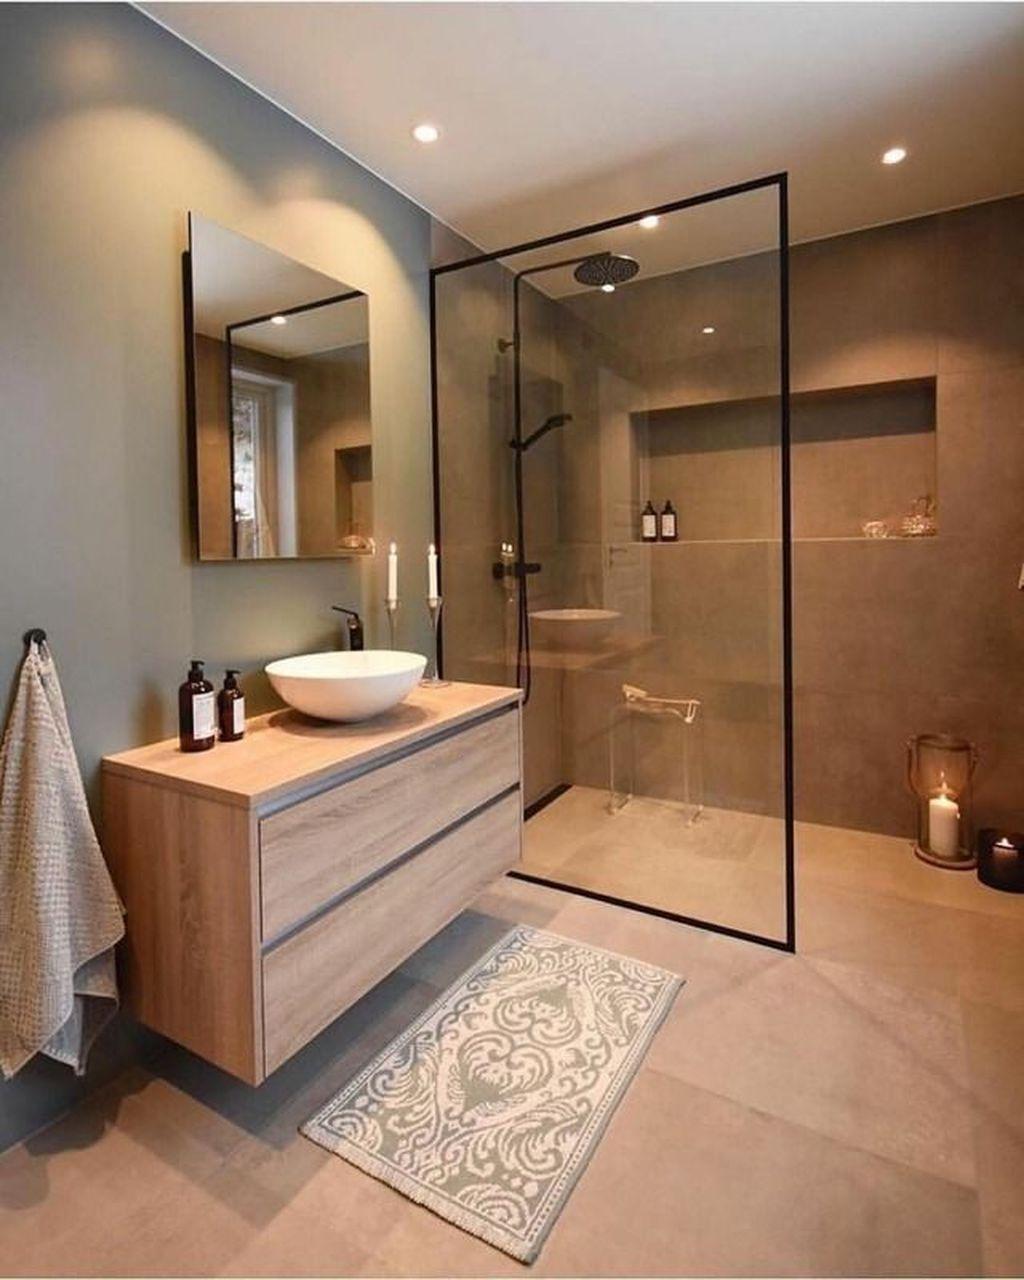 51 Elegant Minimalist Bathroom Design Ideas For Modern Home Decor In 2020 Minimalist Bathroom Bathroom Interior Bathroom Interior Design